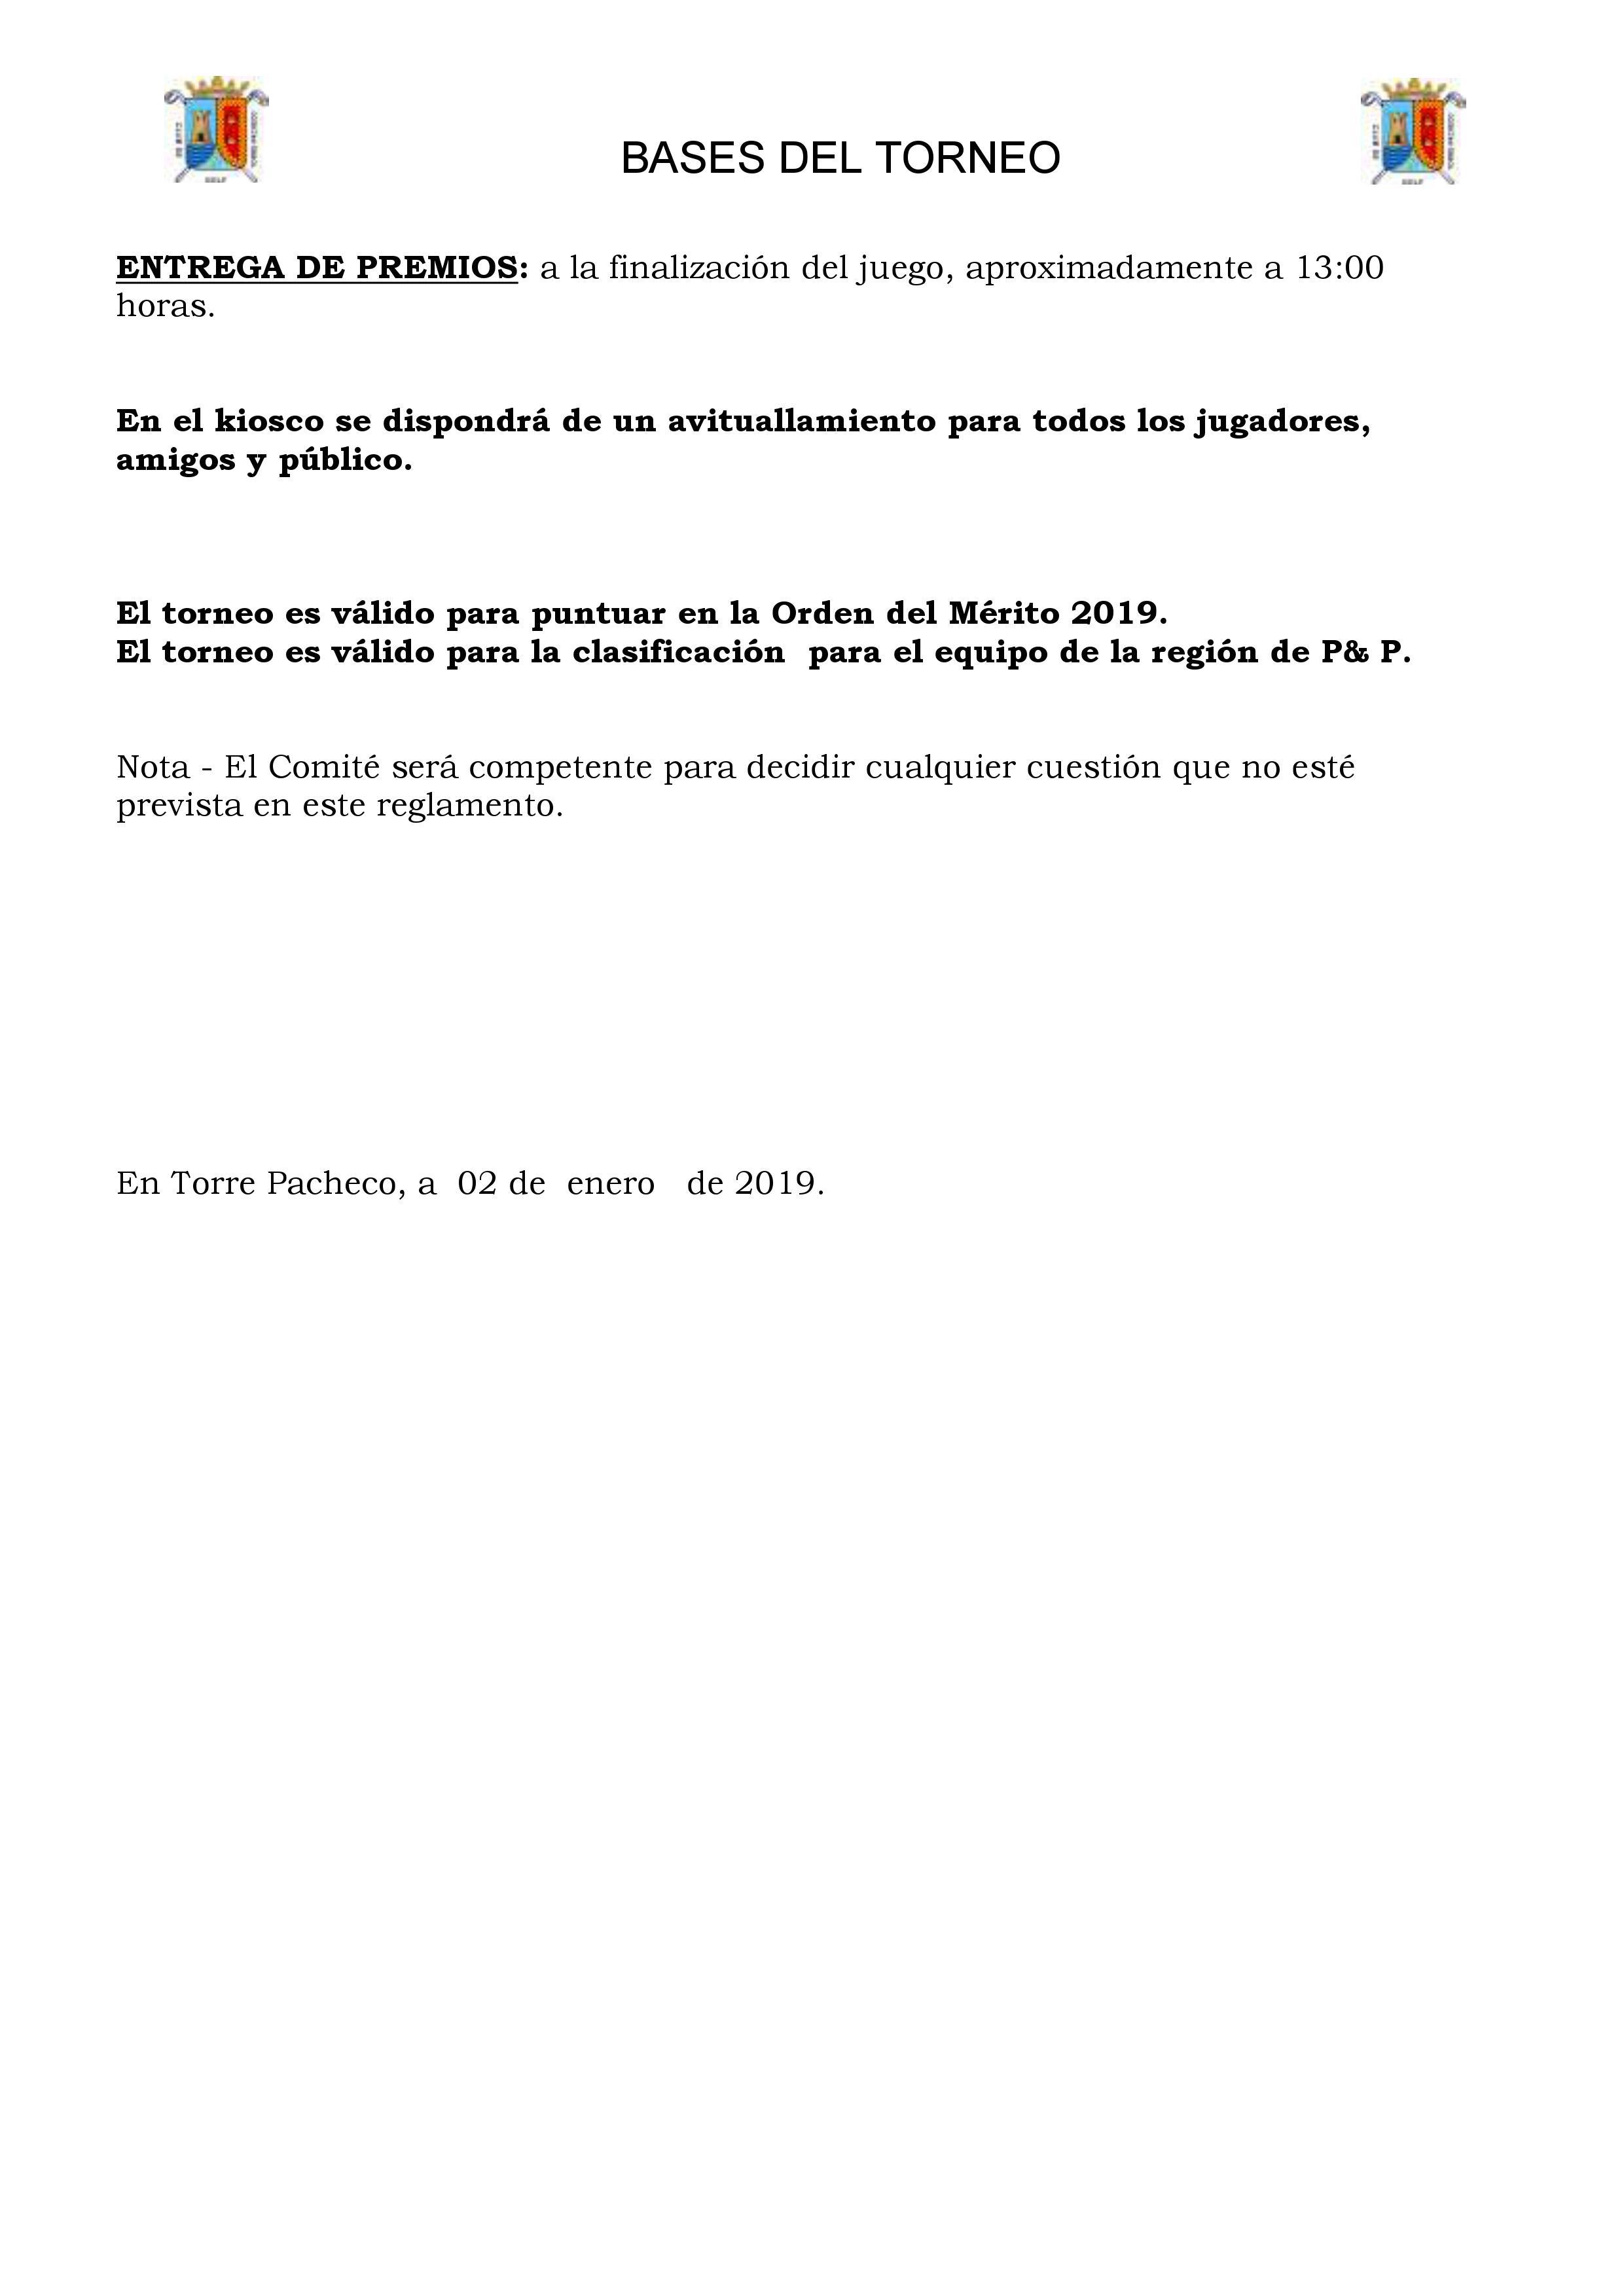 190120 TPA, Reglamento (2)